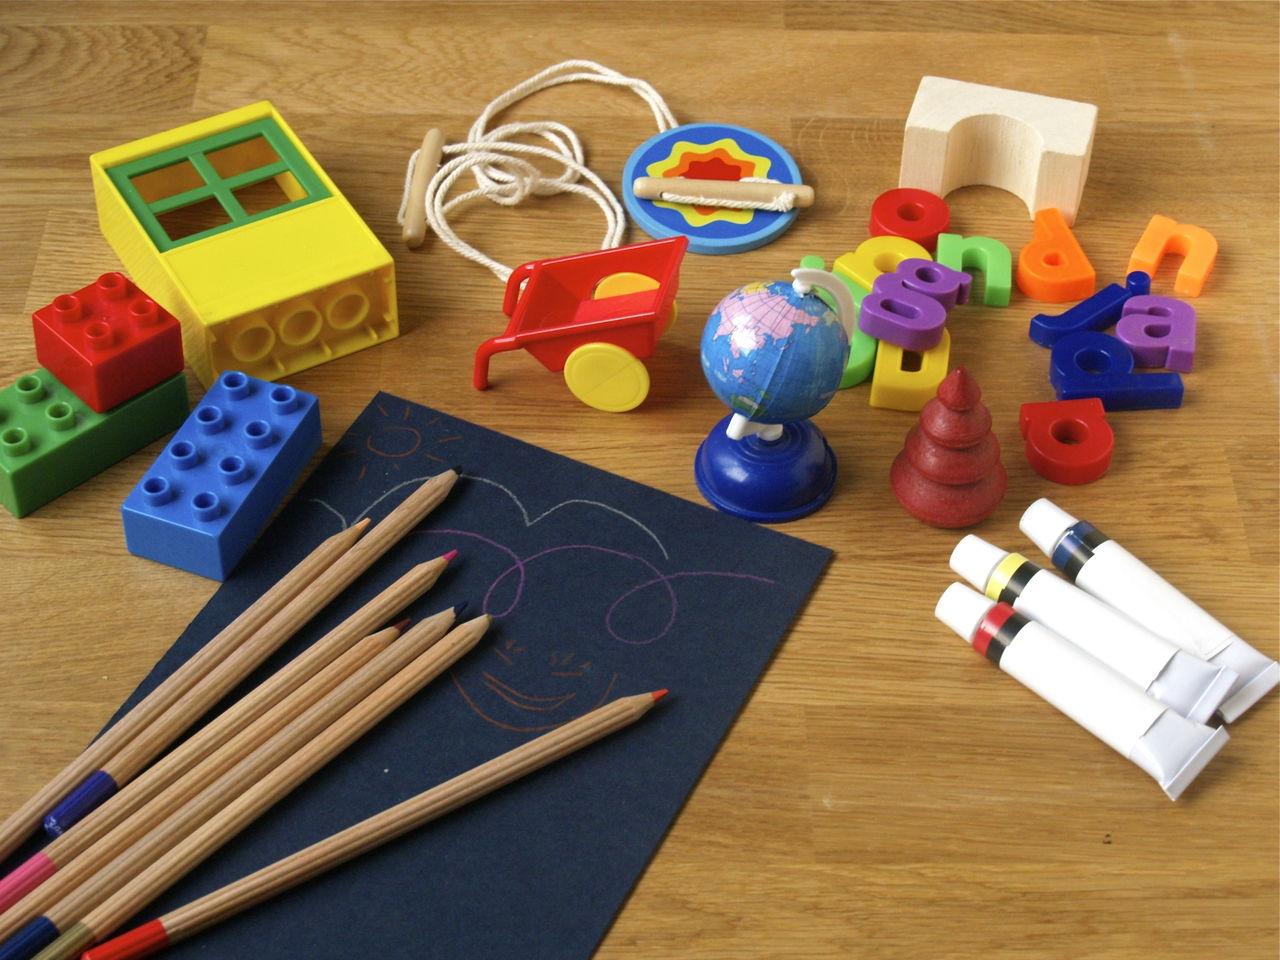 High Angle View Of Toys On Hardwood Floor